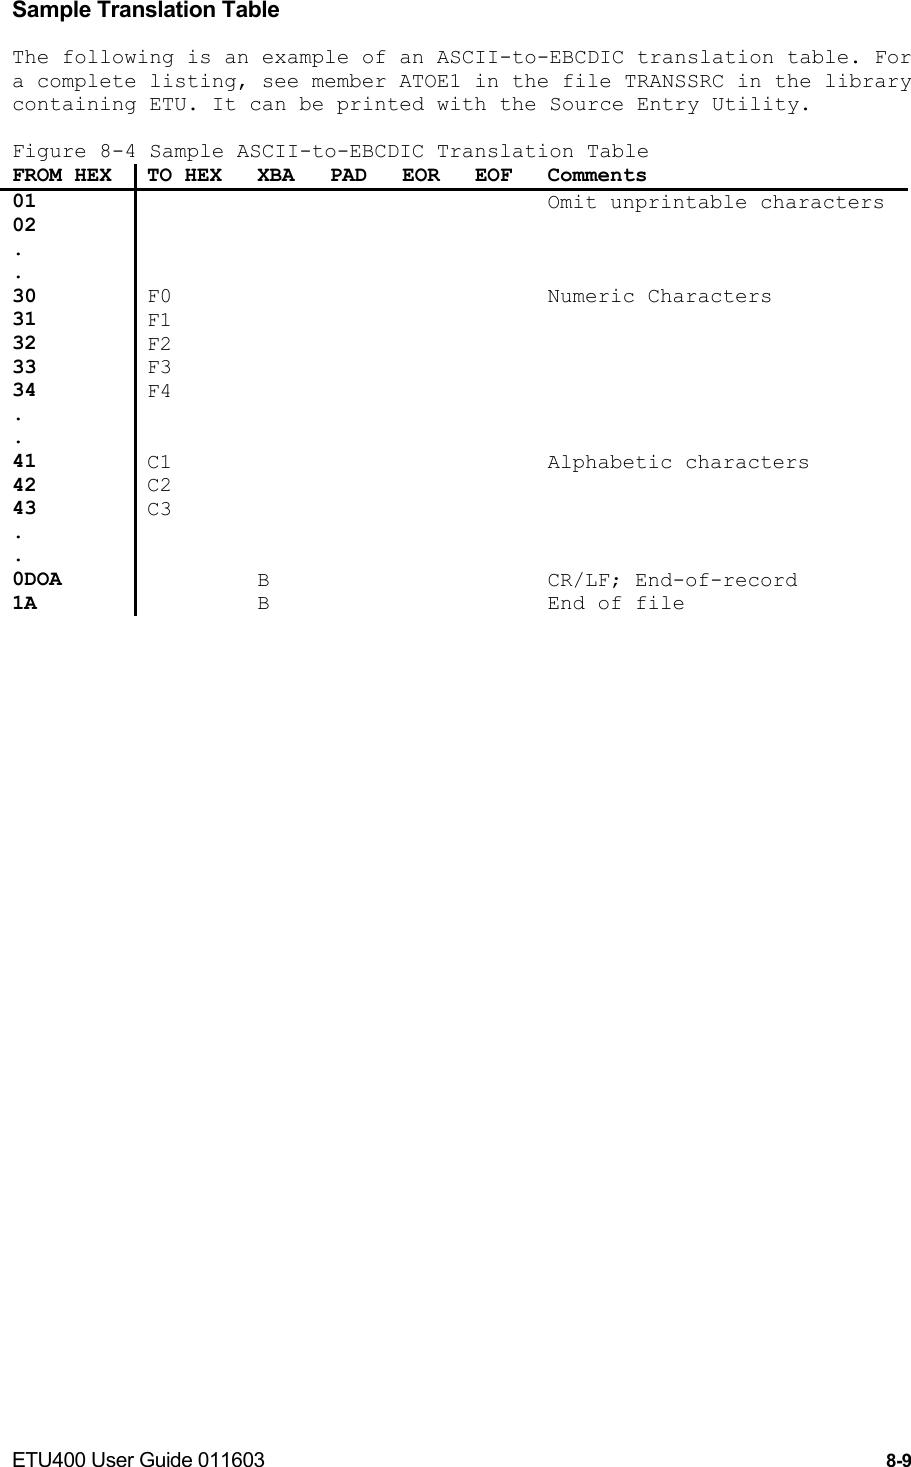 Nlynx Etu400 Users Manual User Guide